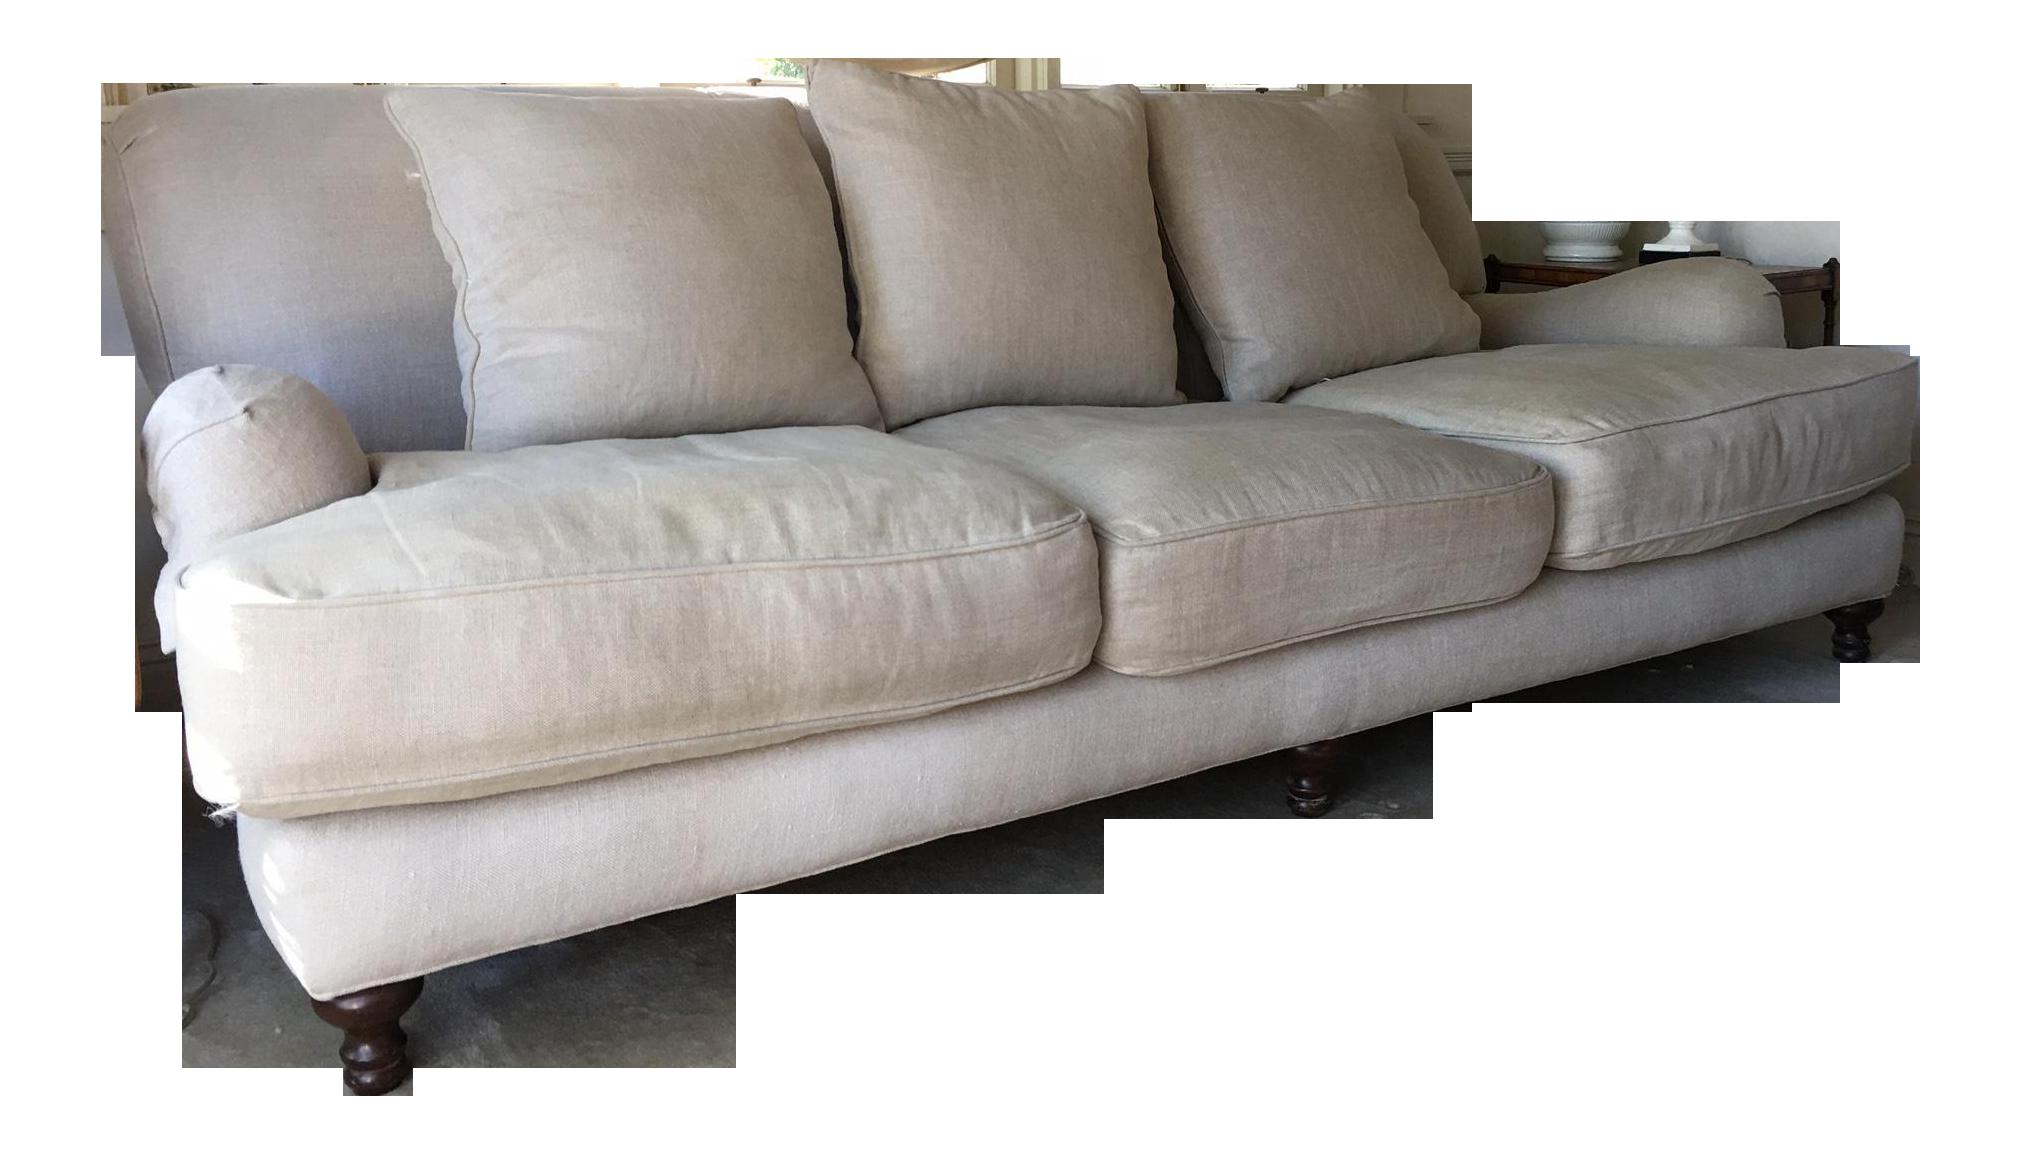 Restoration Hardware Sand Linen English Roll Arm Sofa